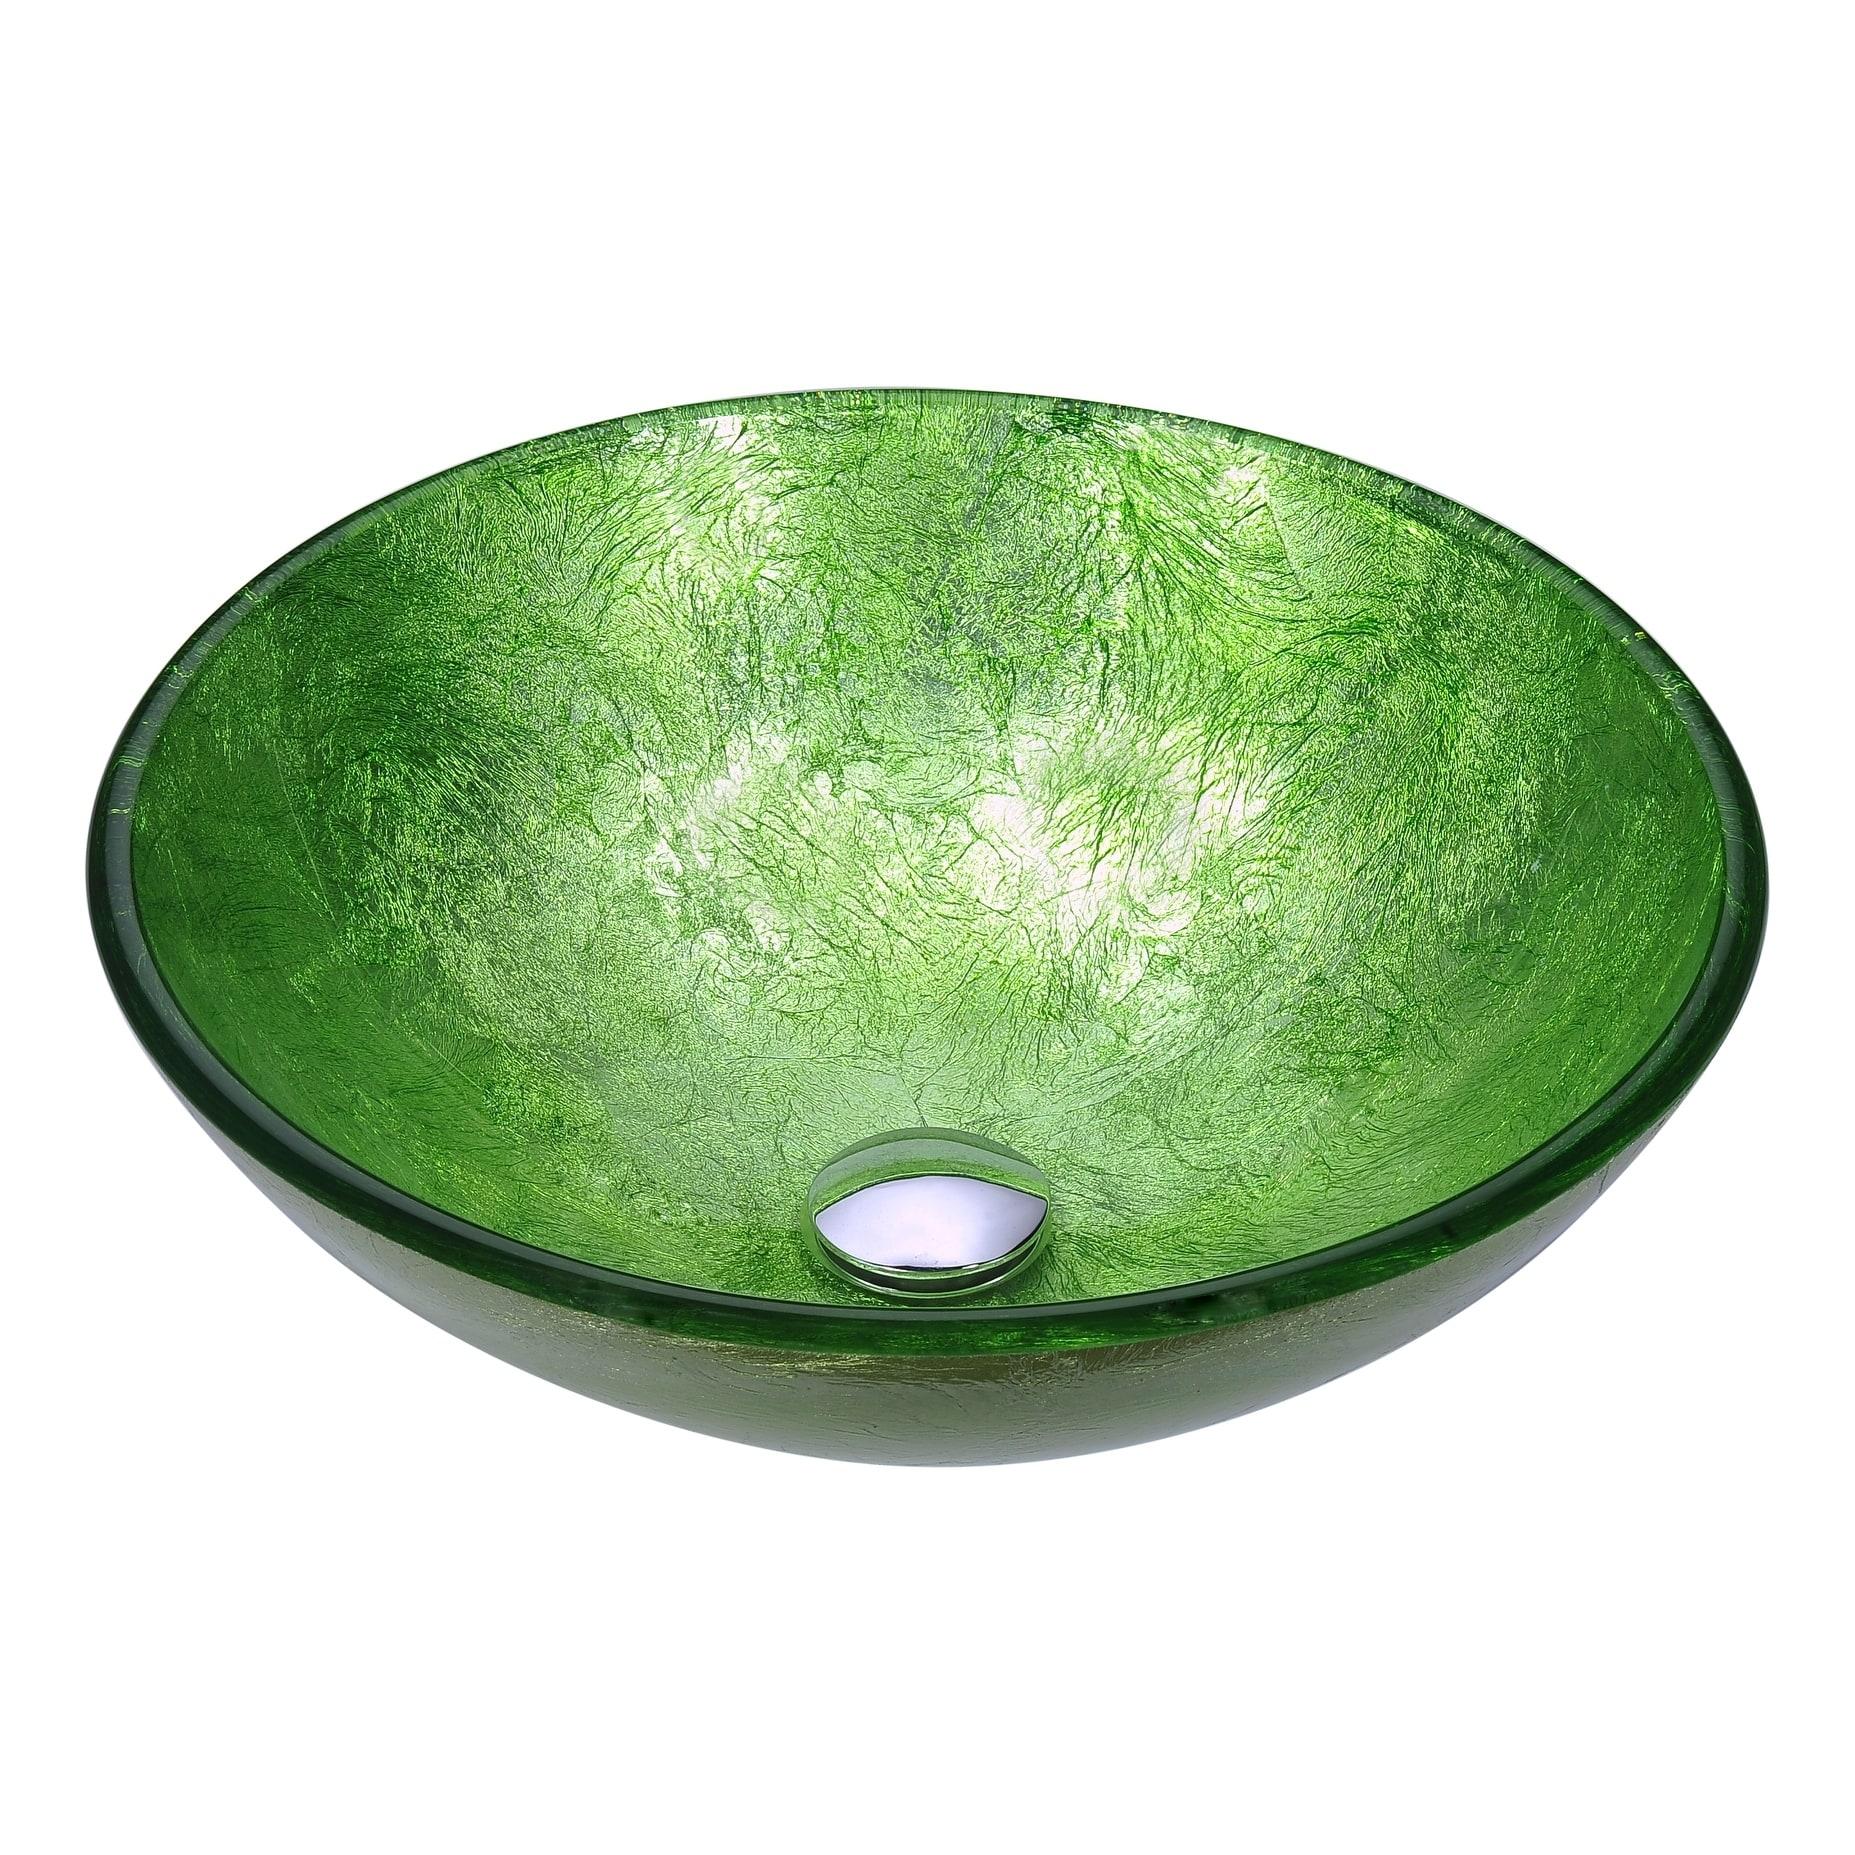 Shop Anzzi Posh Series Deco Glass Vessel Sink In Golden Green Free